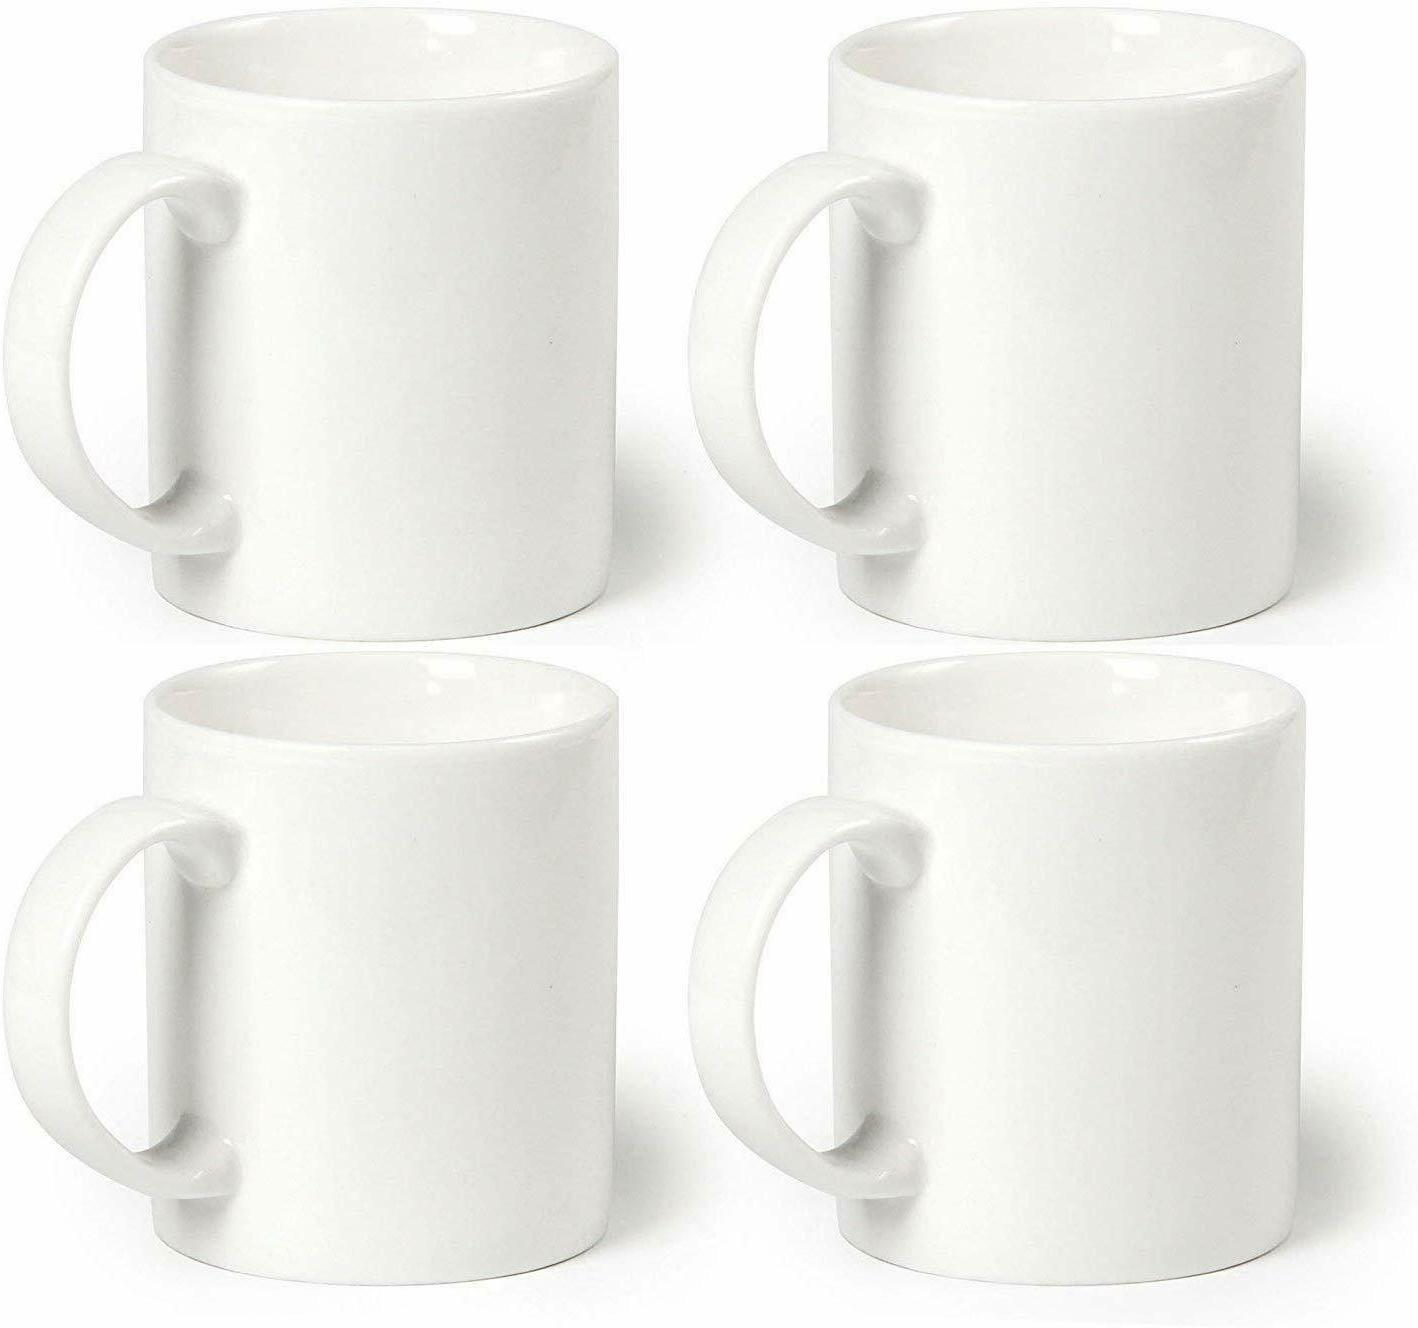 Pack of Mug for Classic Mugs